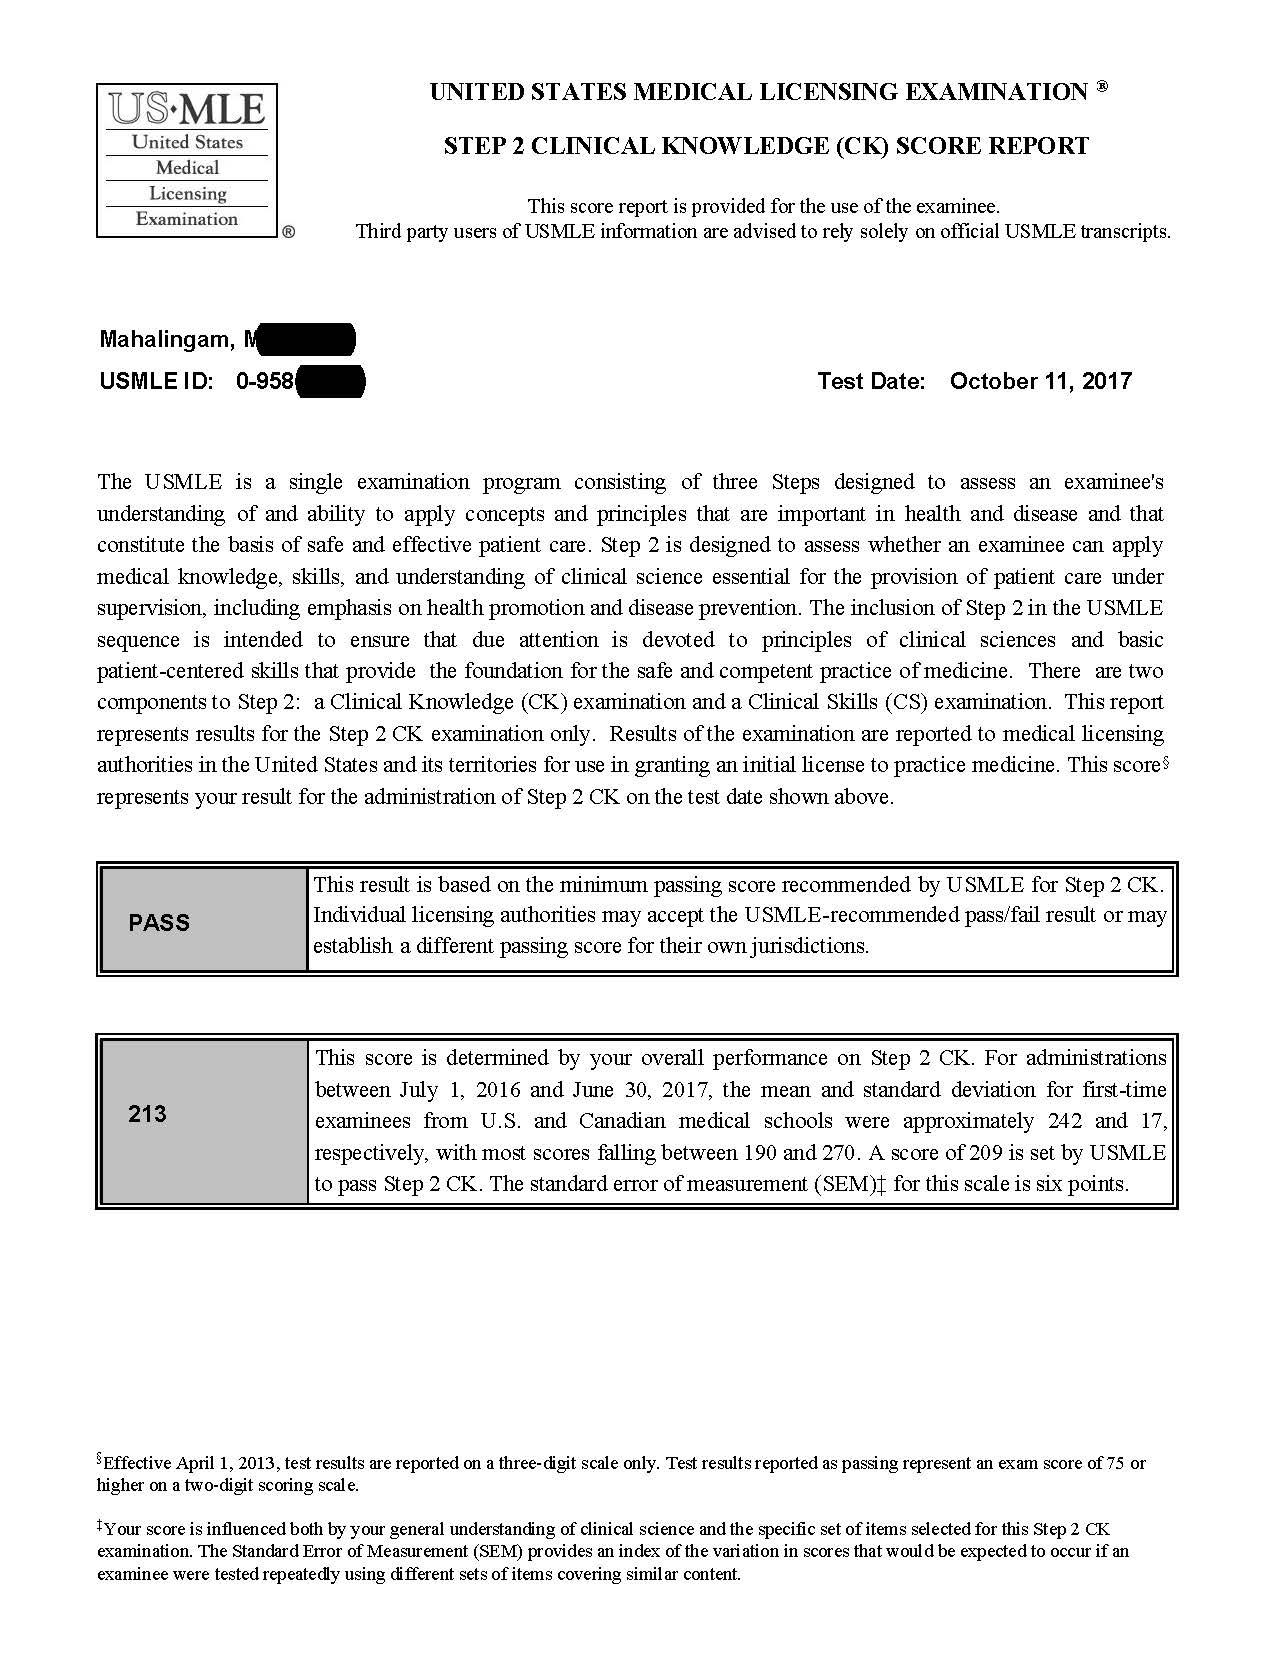 Step 2 Ck Score Release Reddit